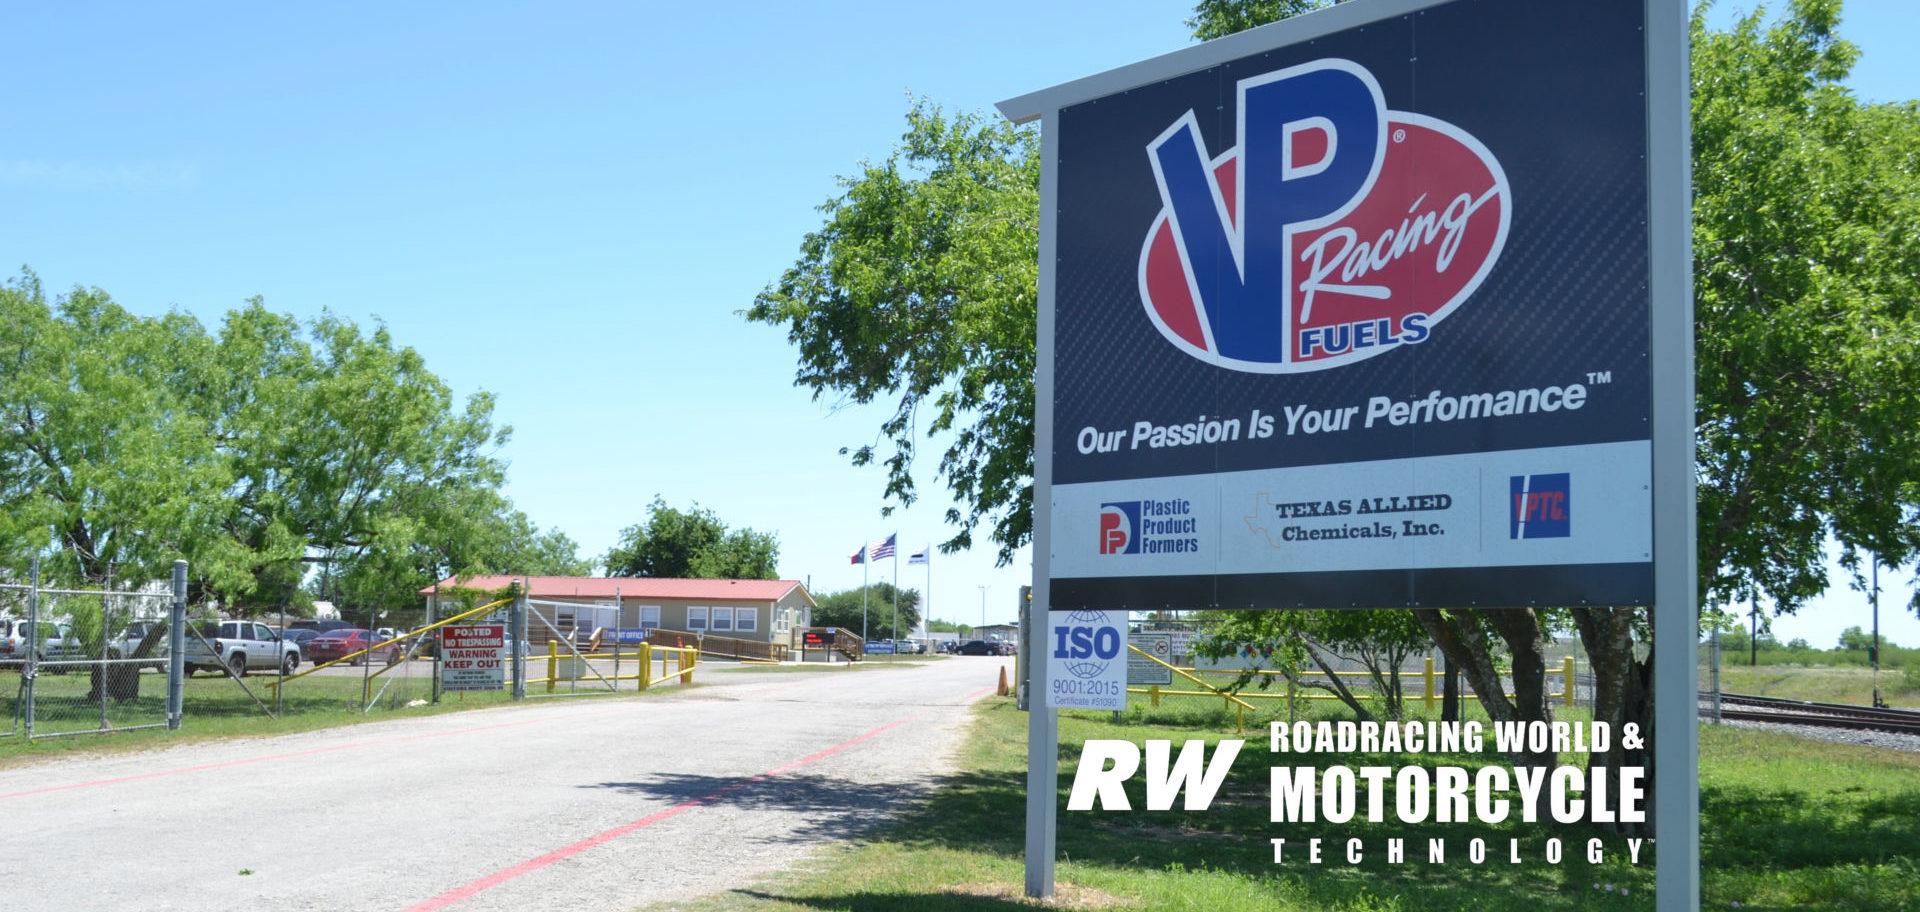 VP Racing Fuels' production facility near San Antonio, Texas. Photo by David Swarts.